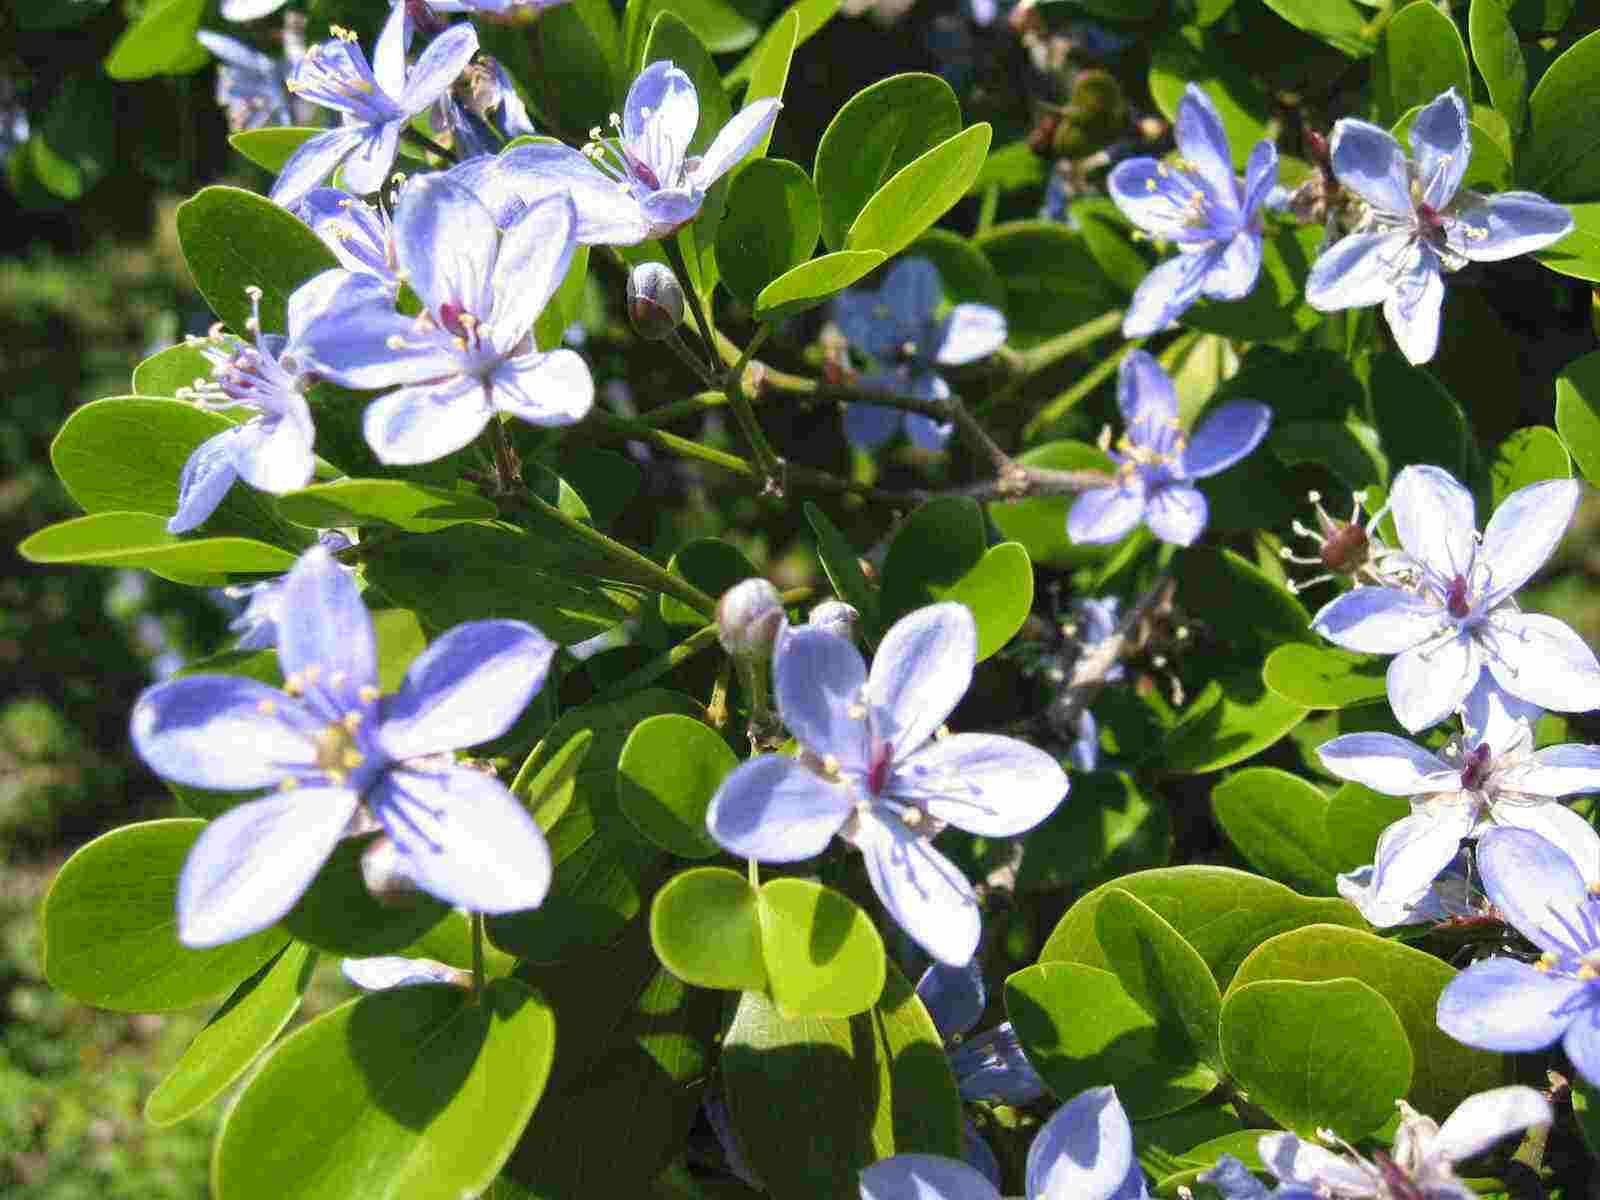 Ligum vitae jamaicas national flower yardi food pinterest ligum vitae jamaicas national flower izmirmasajfo